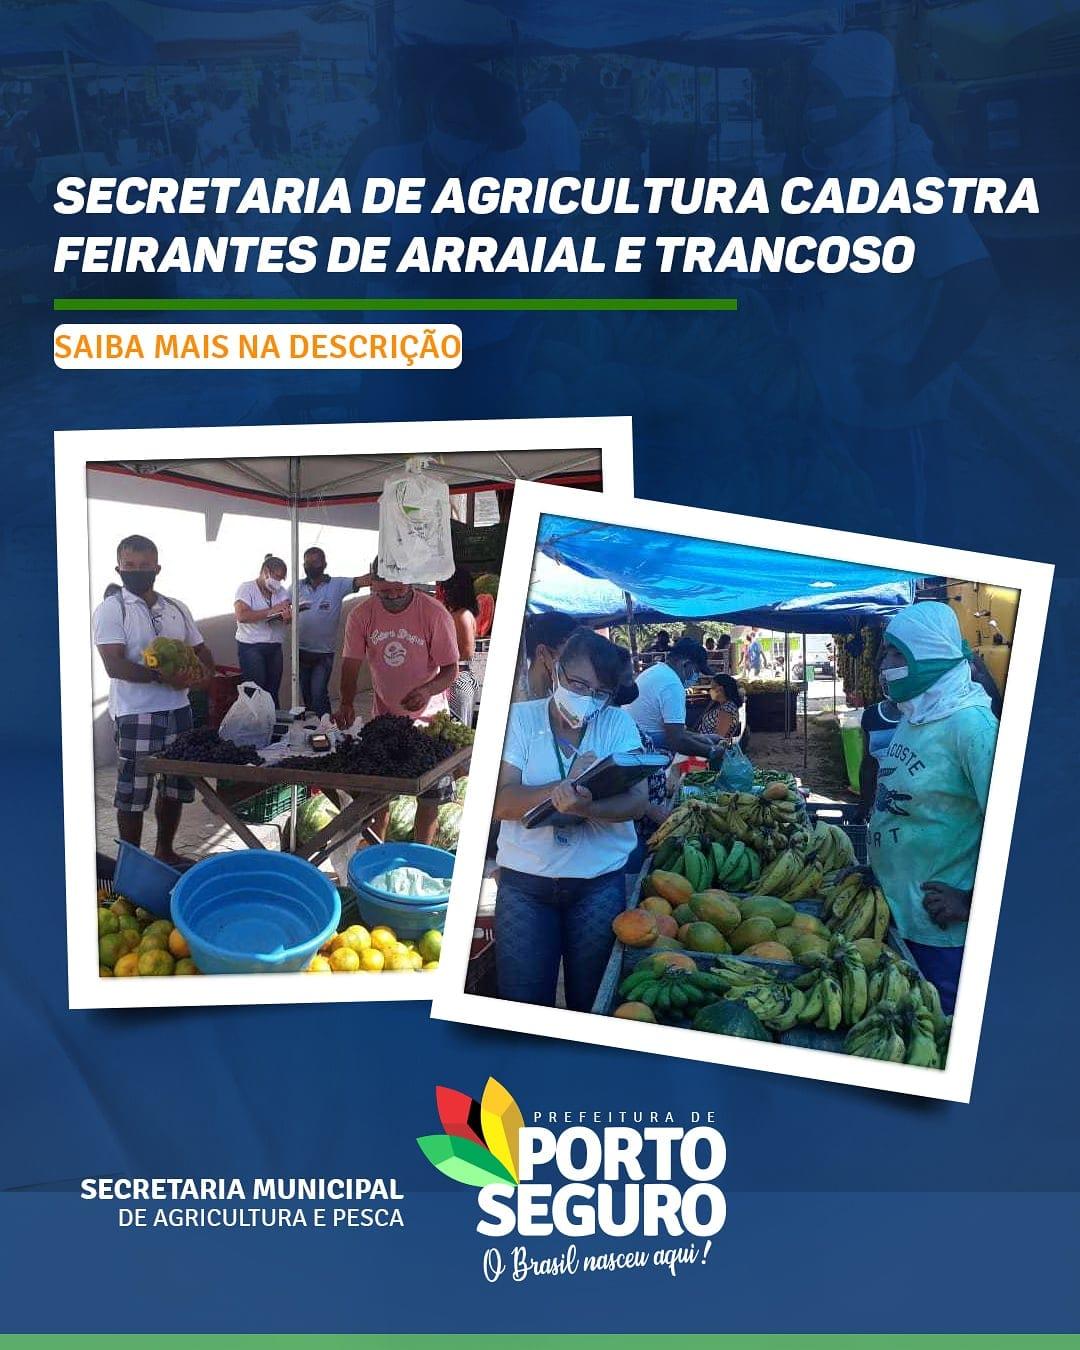 Secretaria de Agricultura cadastra Feirantes de Arraial d´Ajuda e Trancoso 18